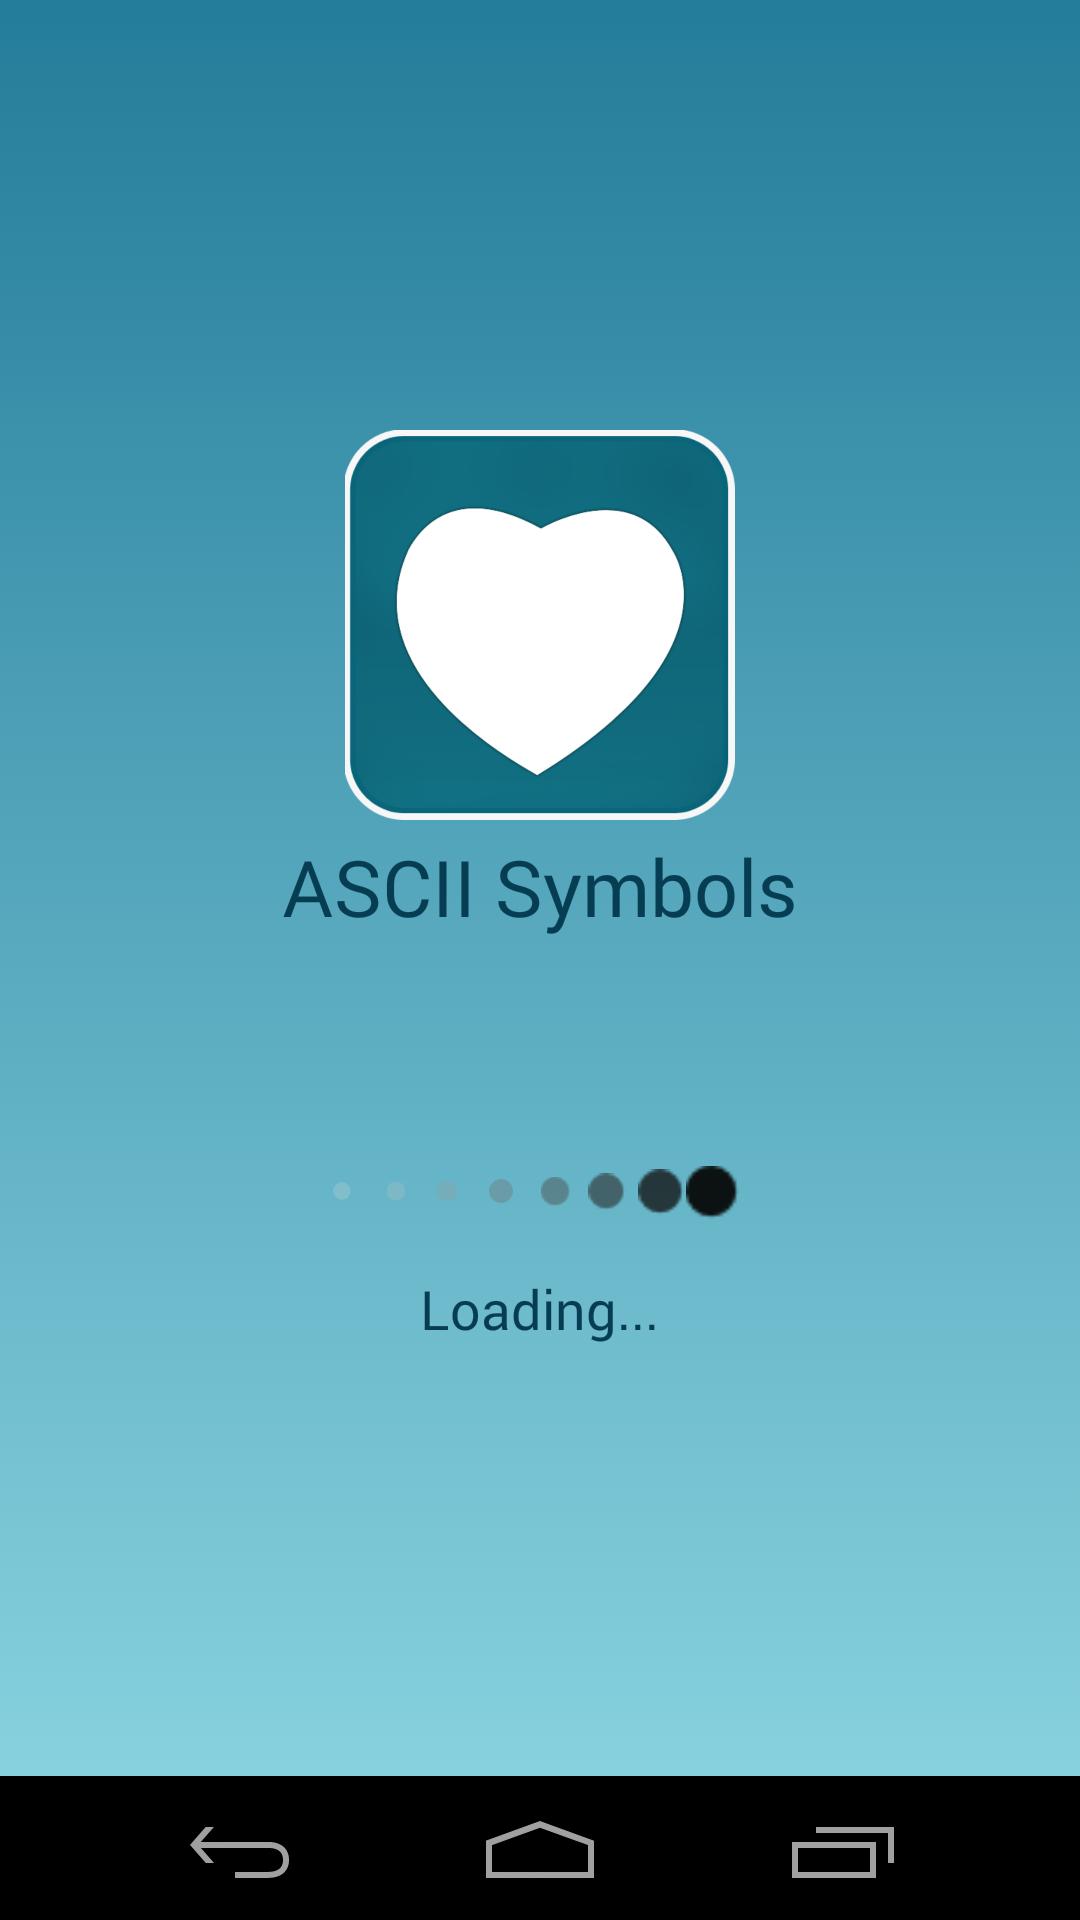 Ascii Text Symbols Top Android App By Sanketbafna Codecanyon